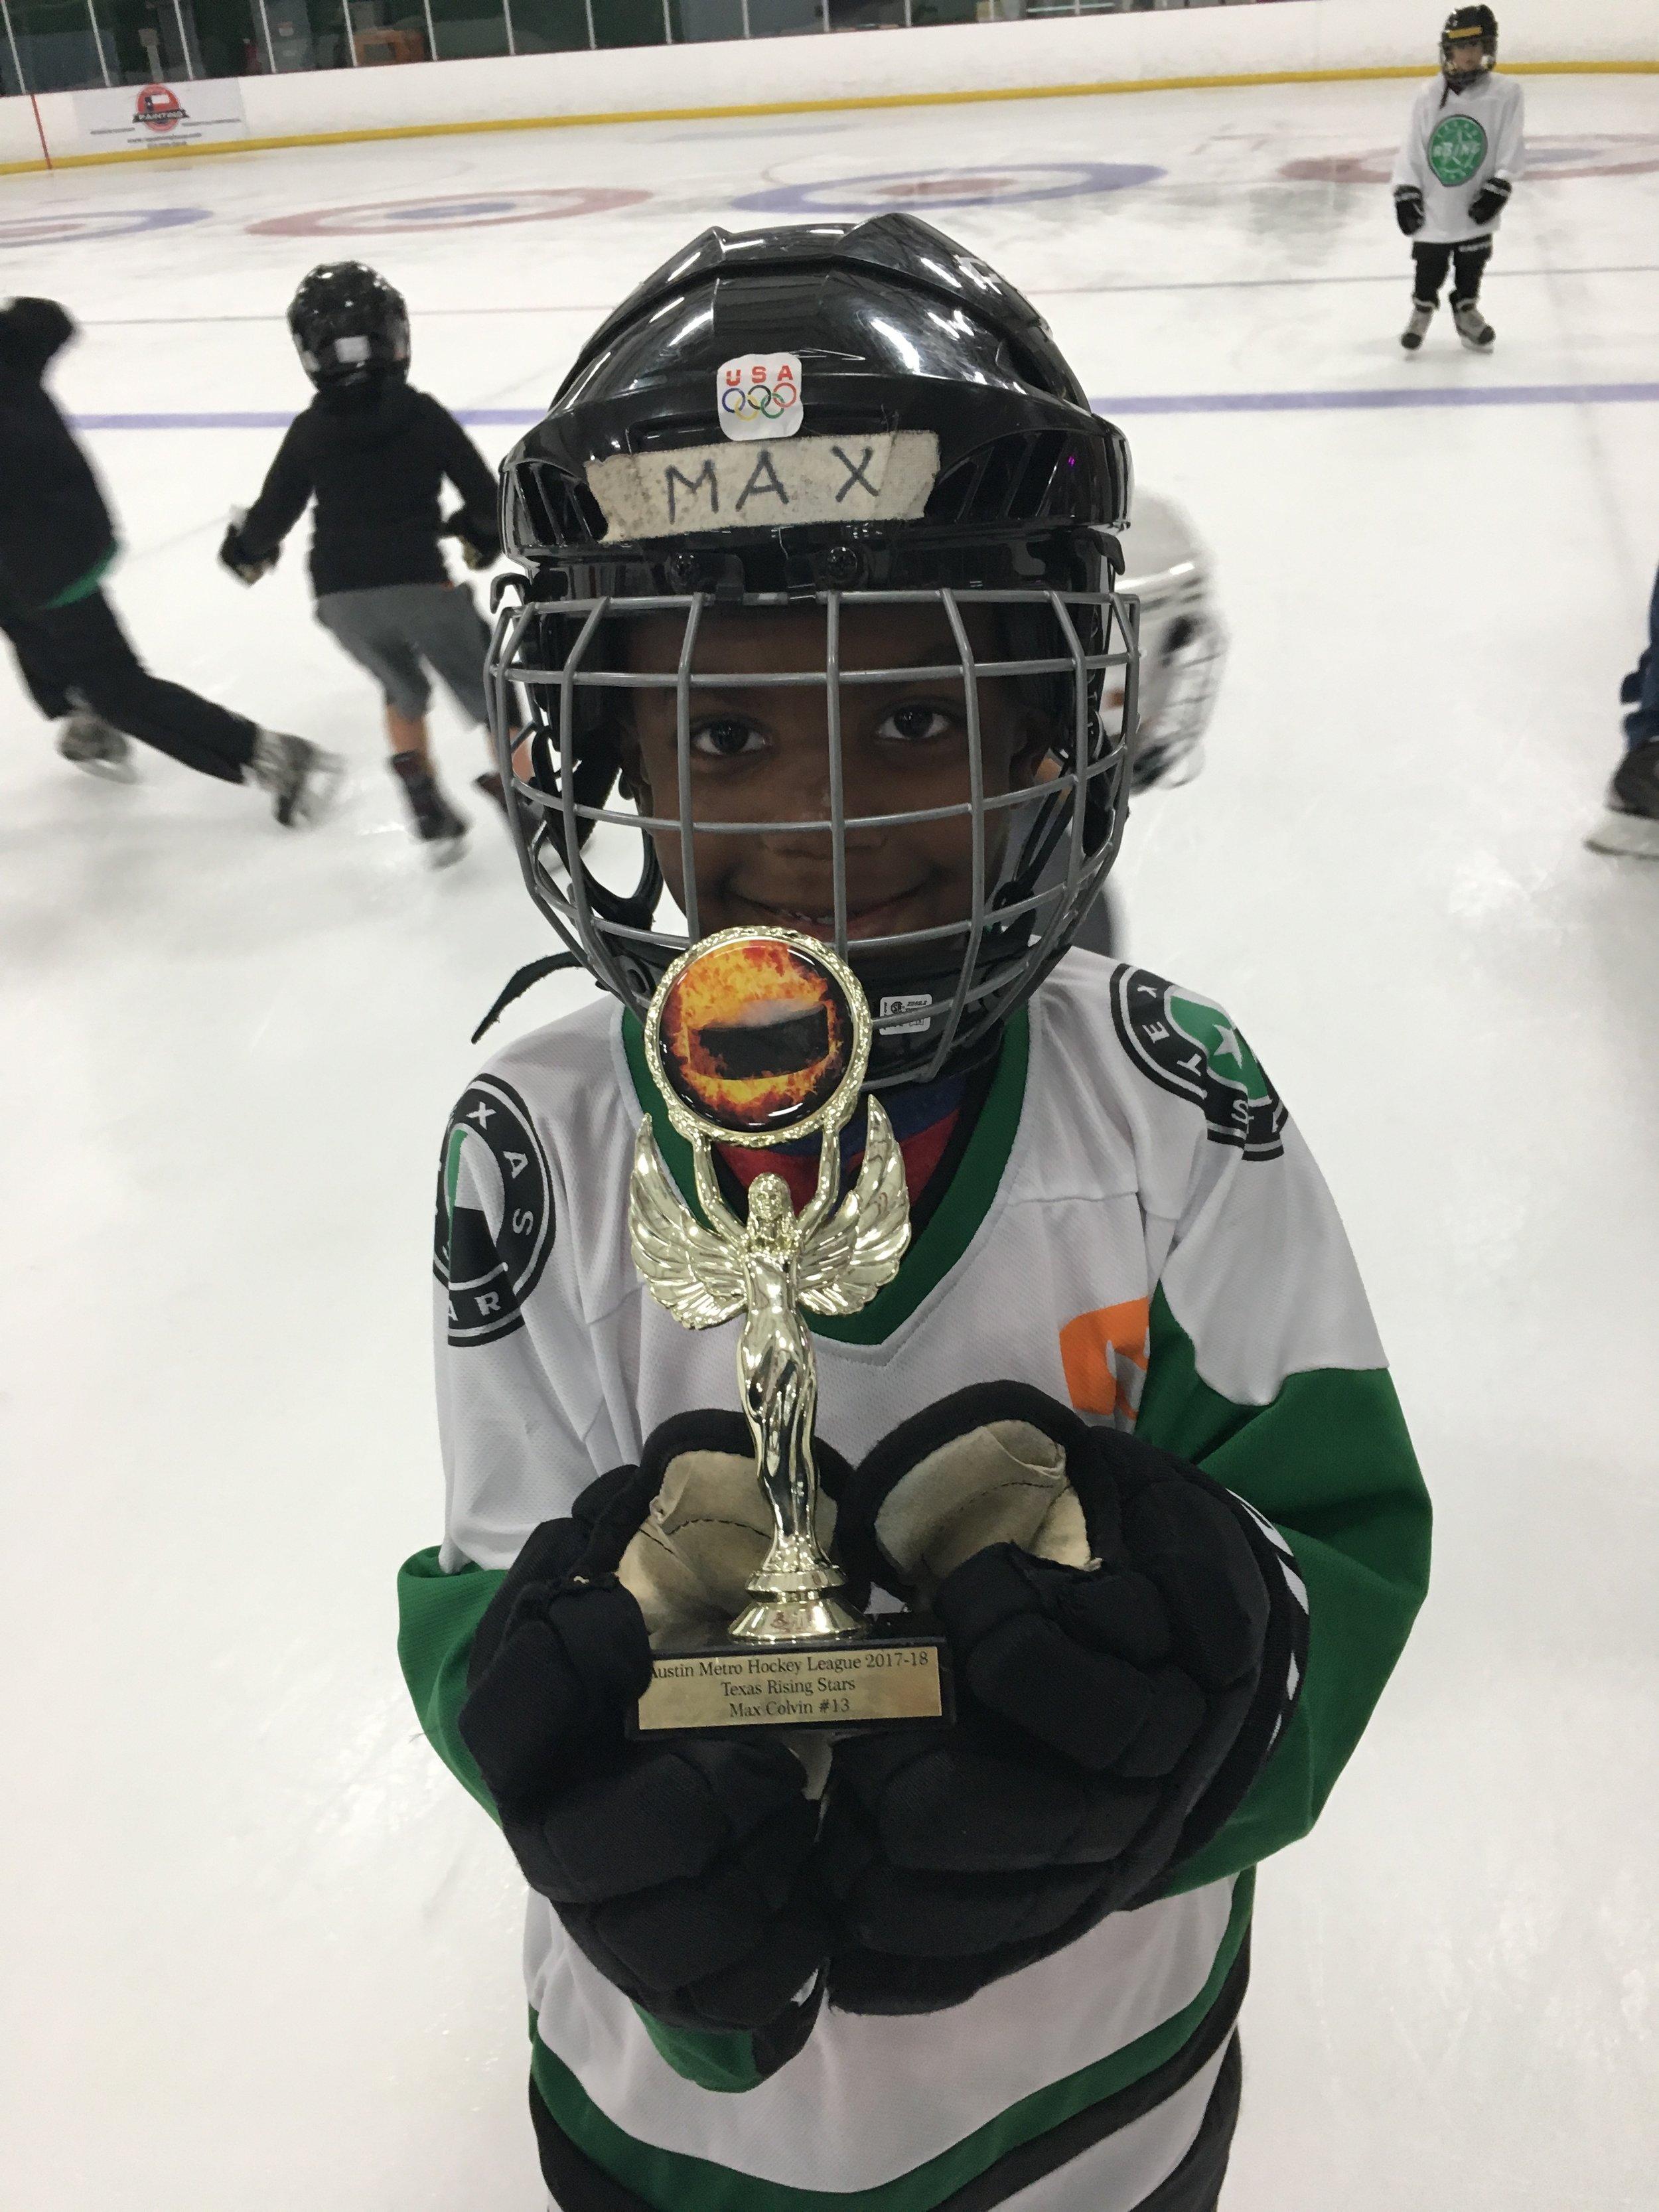 Max plays hockey